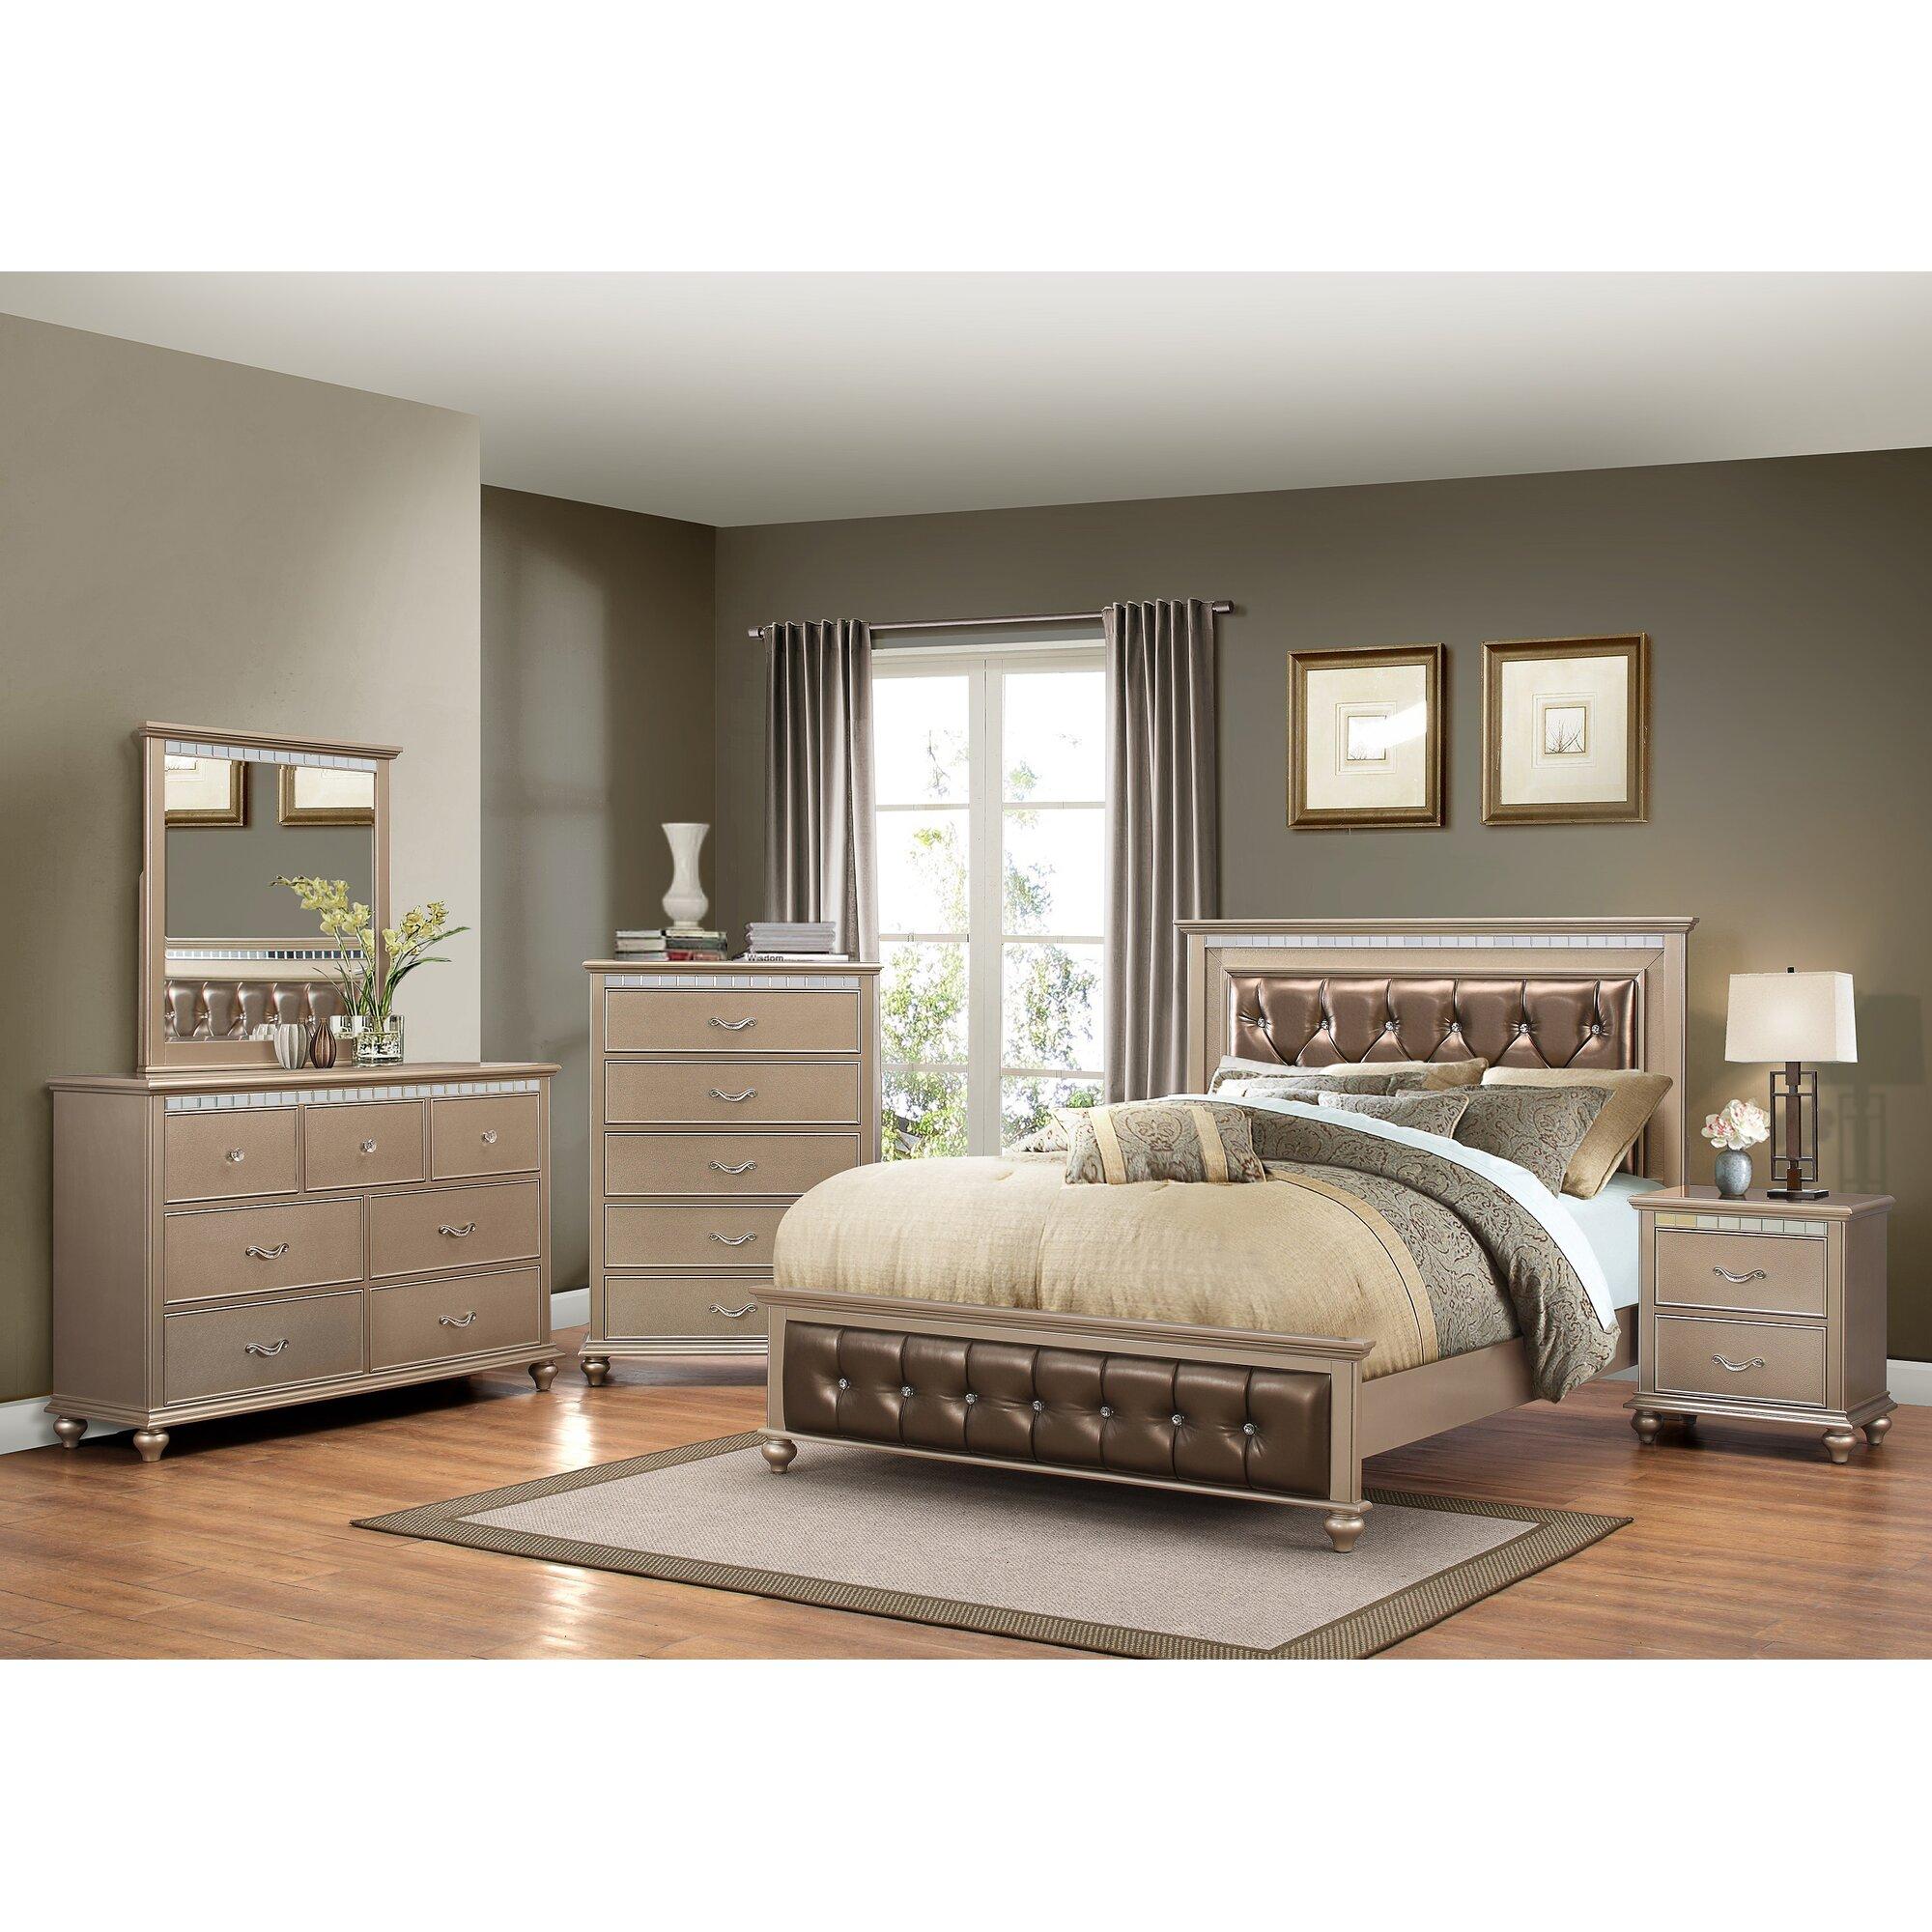 Willa arlo interiors almerton 5 drawer chest by simmons - Willa arlo interiors keeley bar cart ...